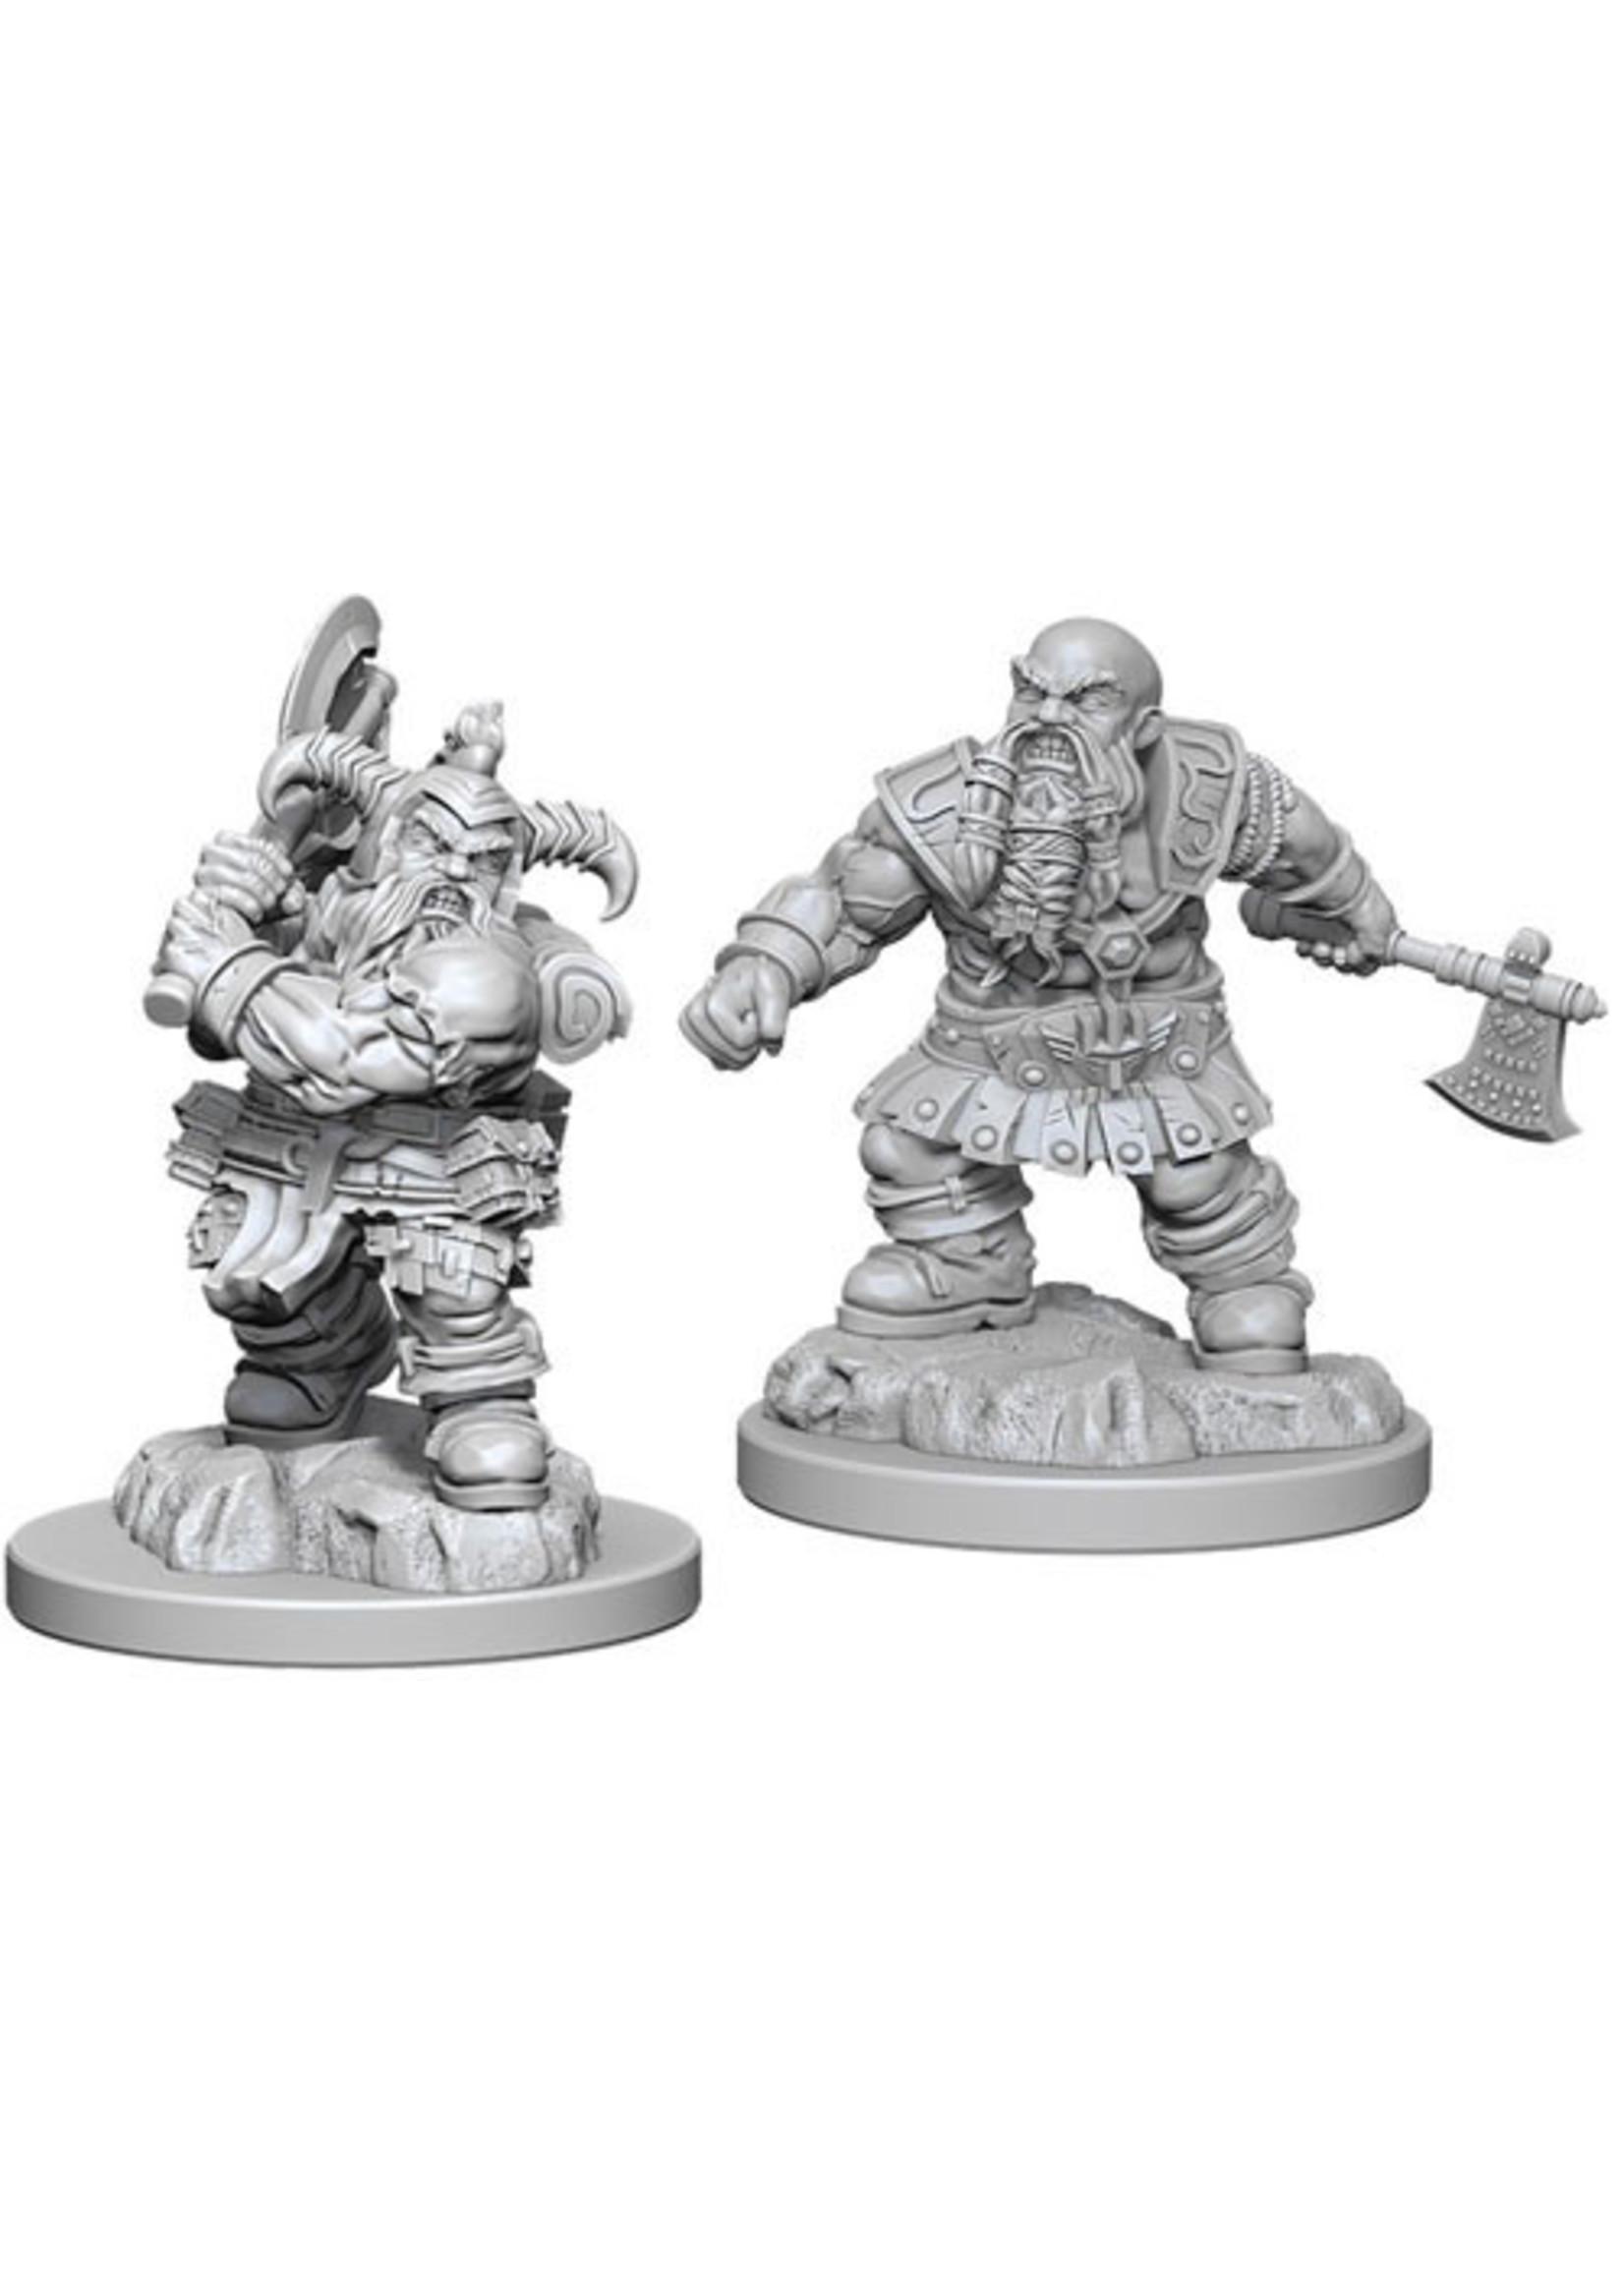 Dungeons & Dragons Nolzur`s Marvelous Unpainted Miniatures: W6 Dwarf Male Barbarian